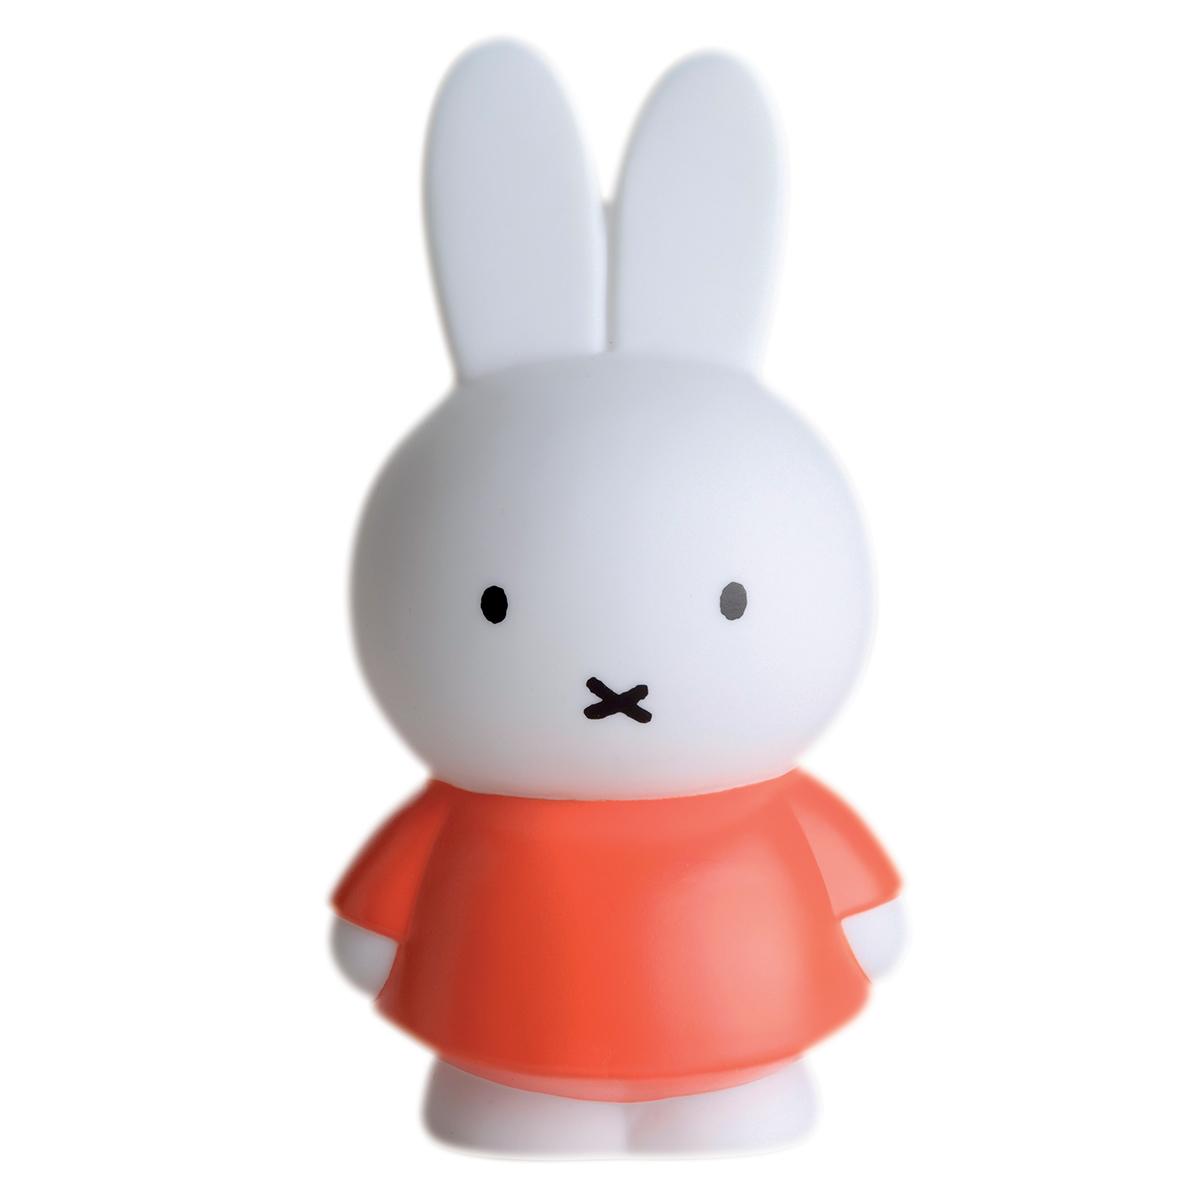 Tirelire Tirelire Miffy Taille Modèle Moyen - Orange Tirelire Miffy Taille Modèle Moyen - Orange